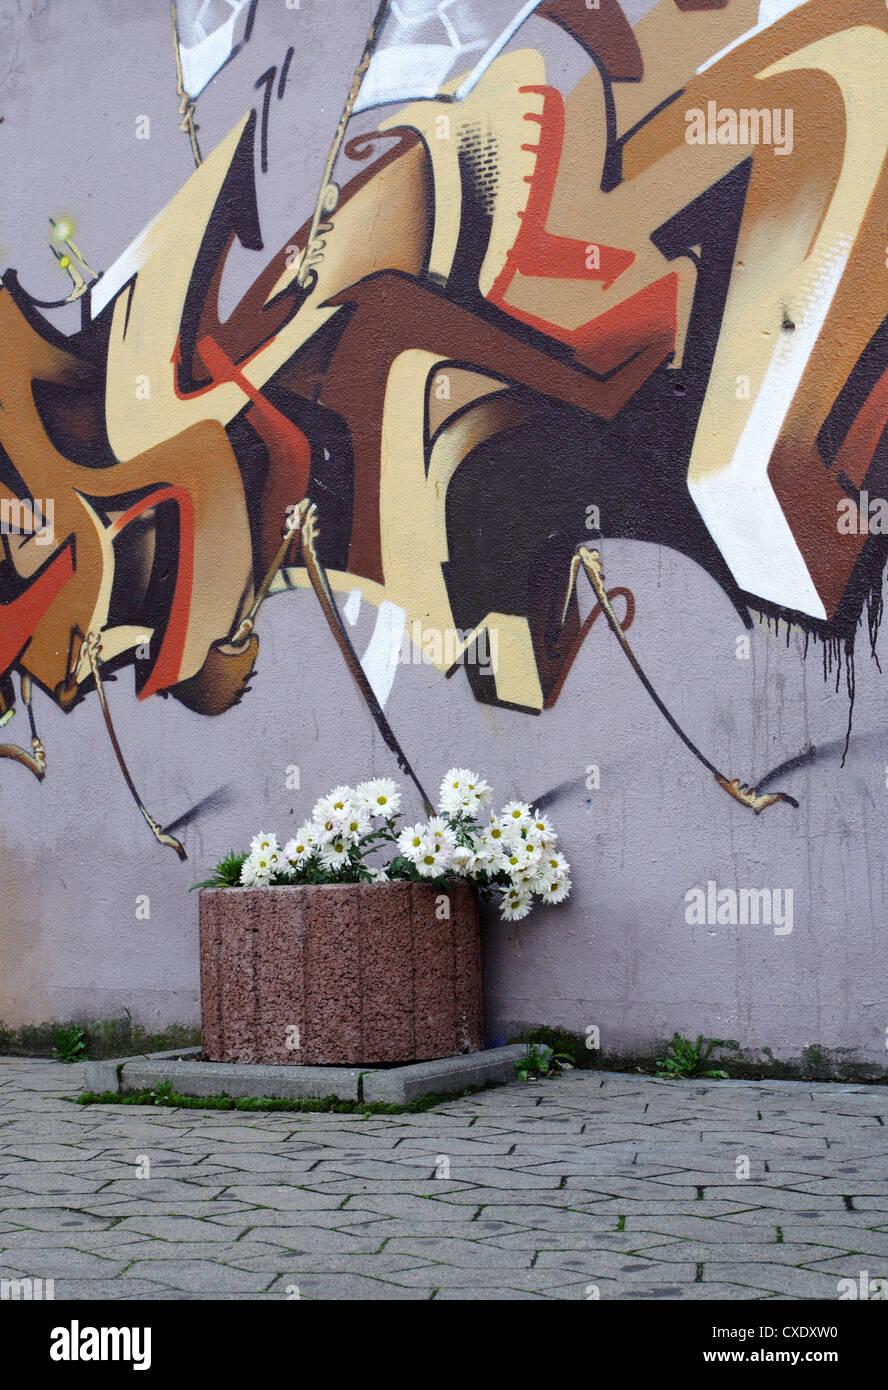 Saarbruecken, Blumenkuebel planted and sprayed with graffiti wall Stock Photo